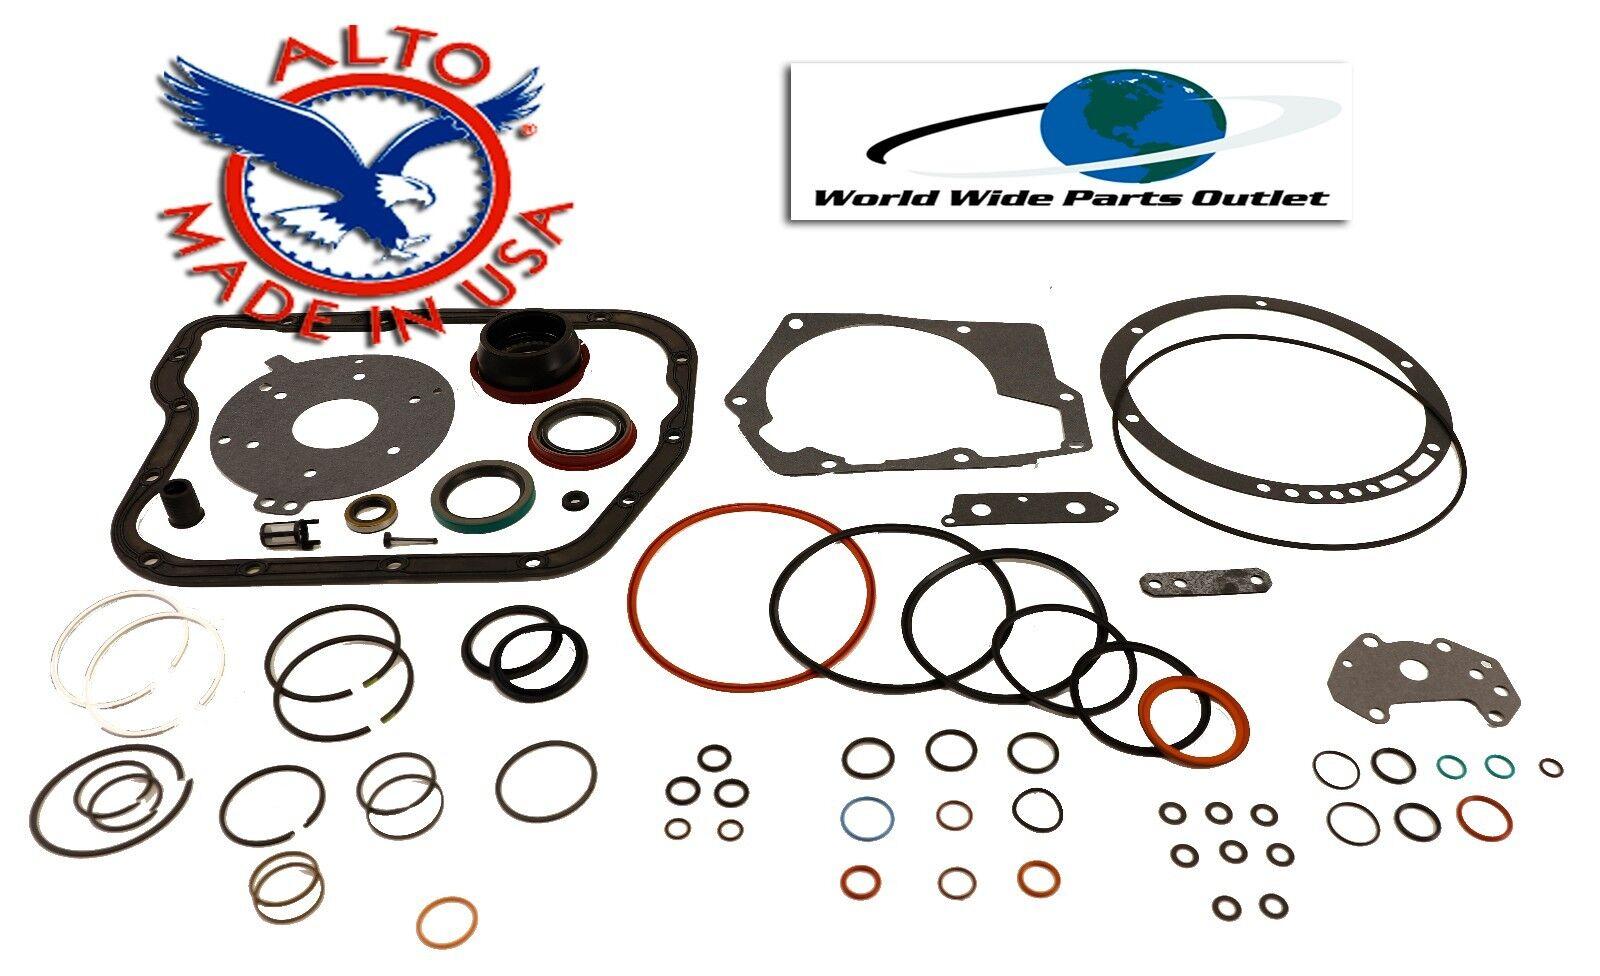 Dodge 48re A618 Transmission Rebuild Kit 2003 On Stage 4 Wundr Shop Jf011e Wire Harness